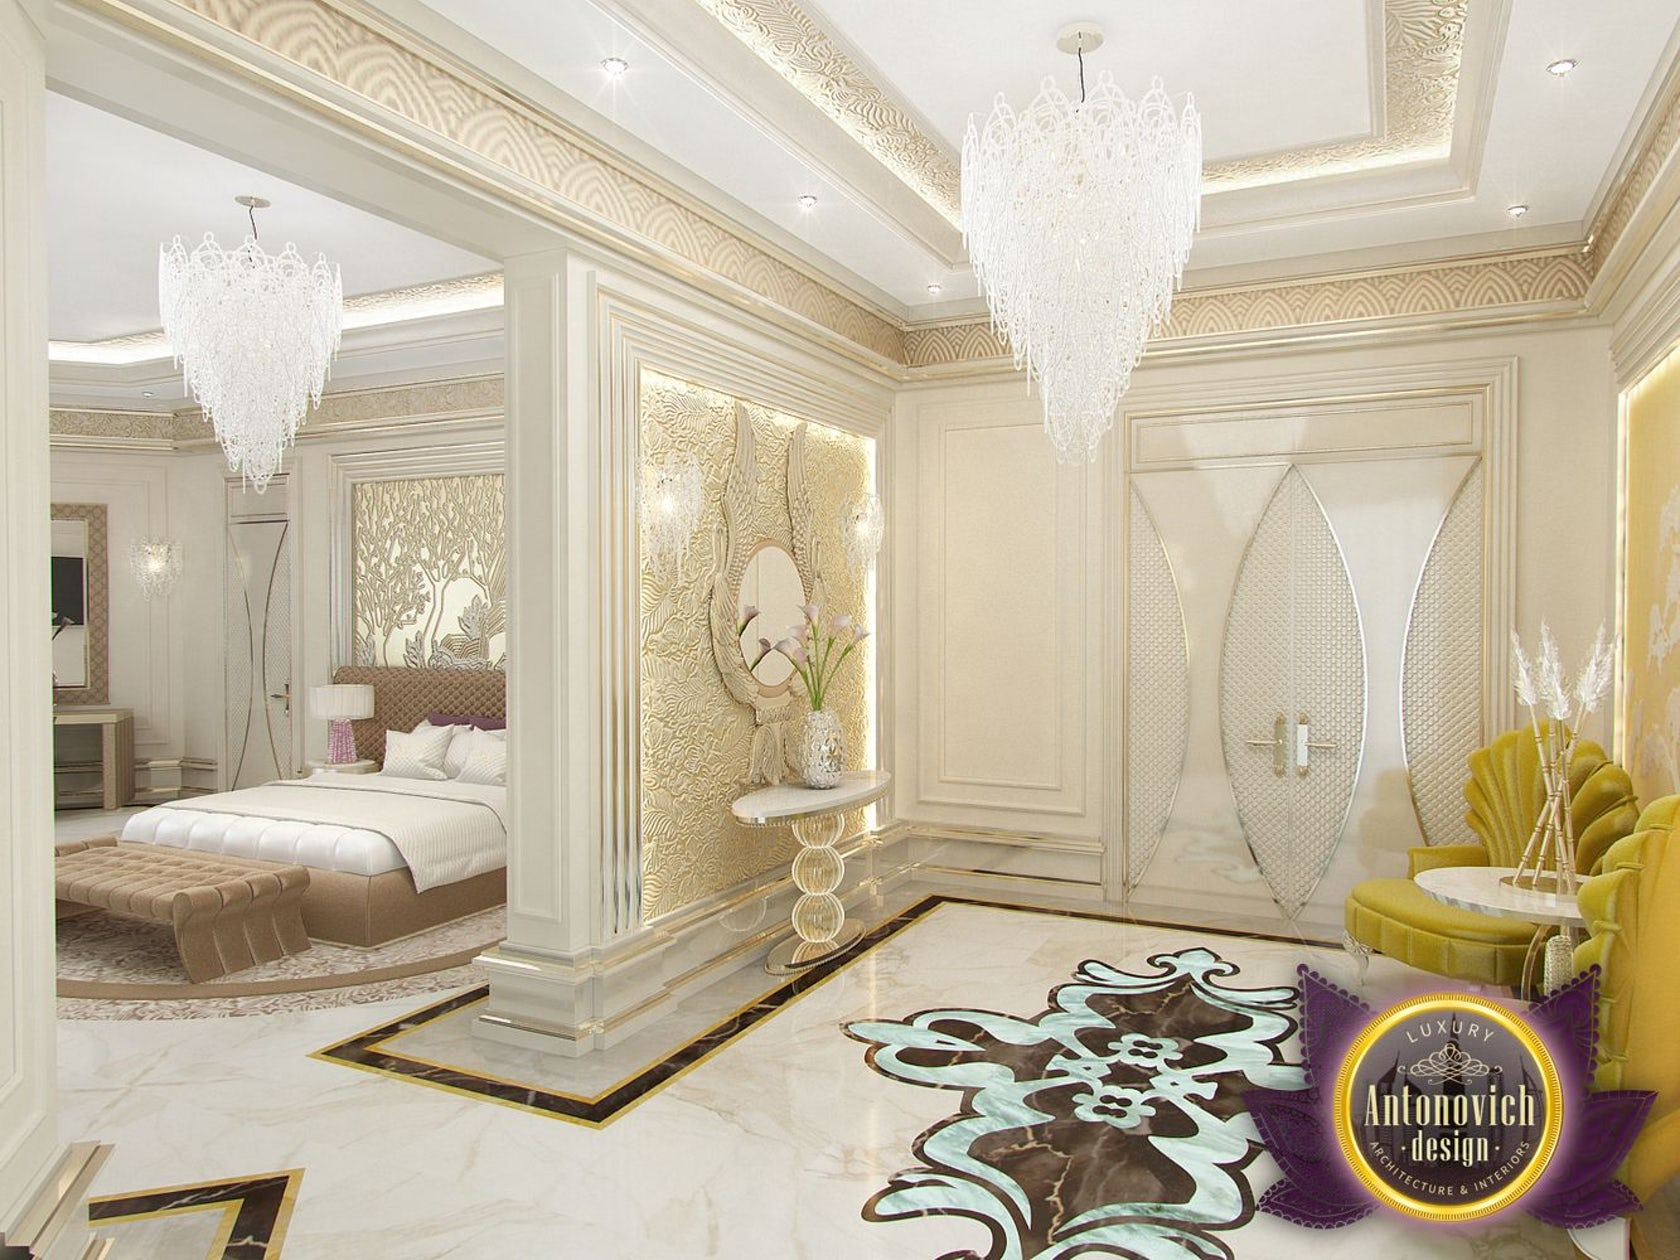 Modern bedroom designs by luxury antonovich design on architizer